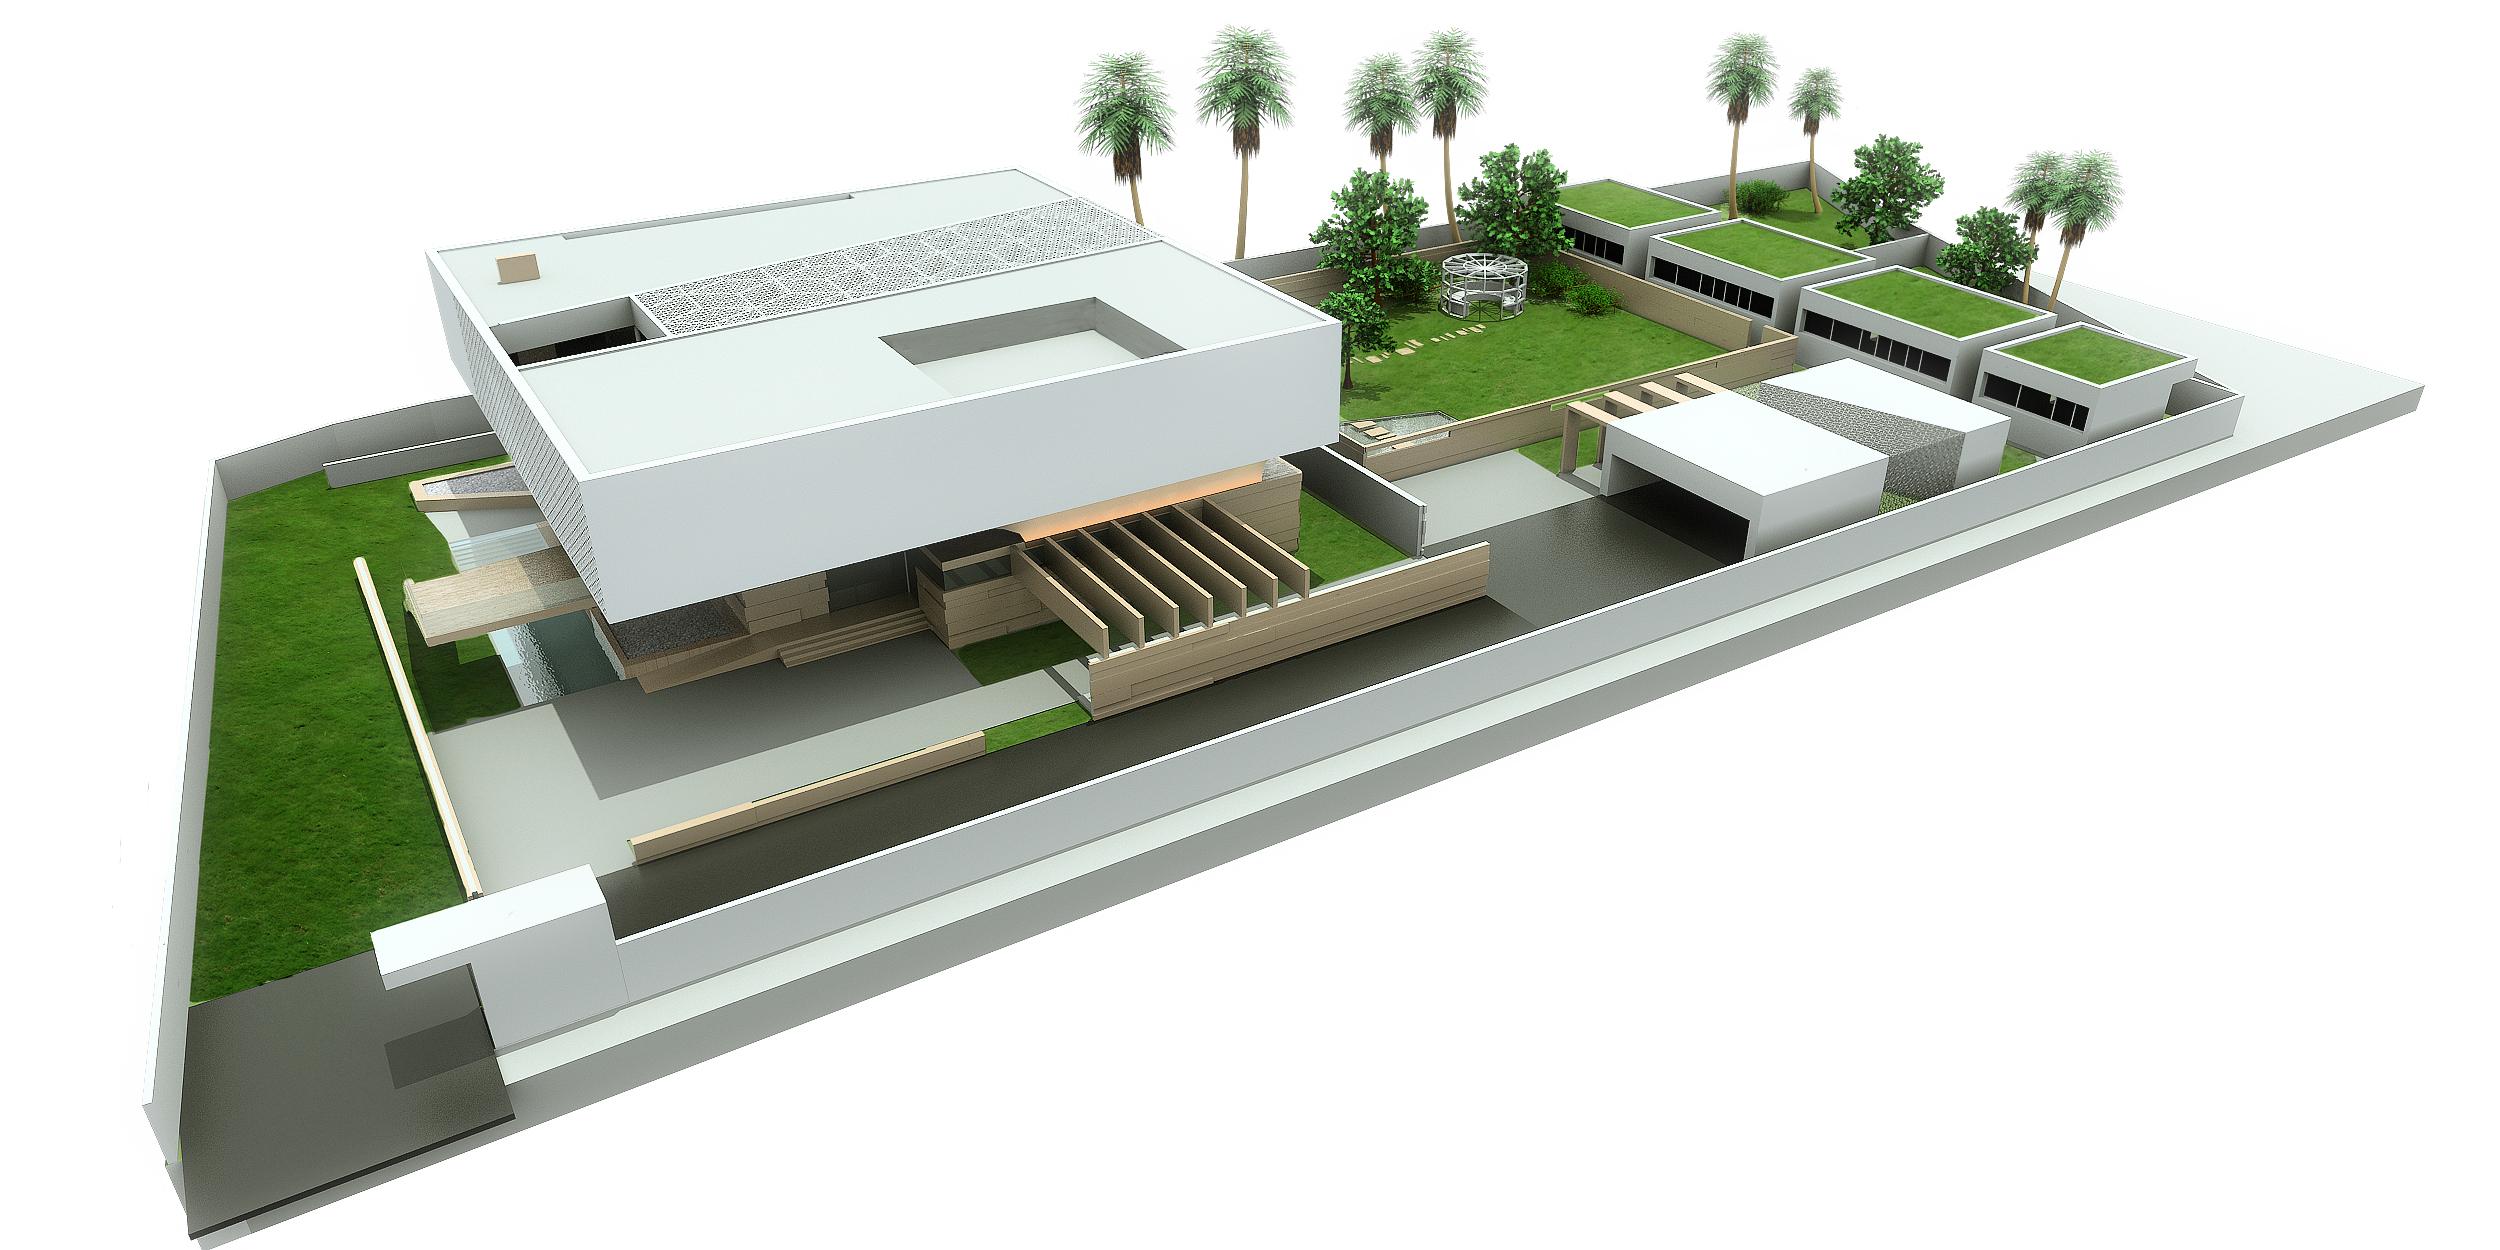 A01 architects - Residence PVP__web03.jpg